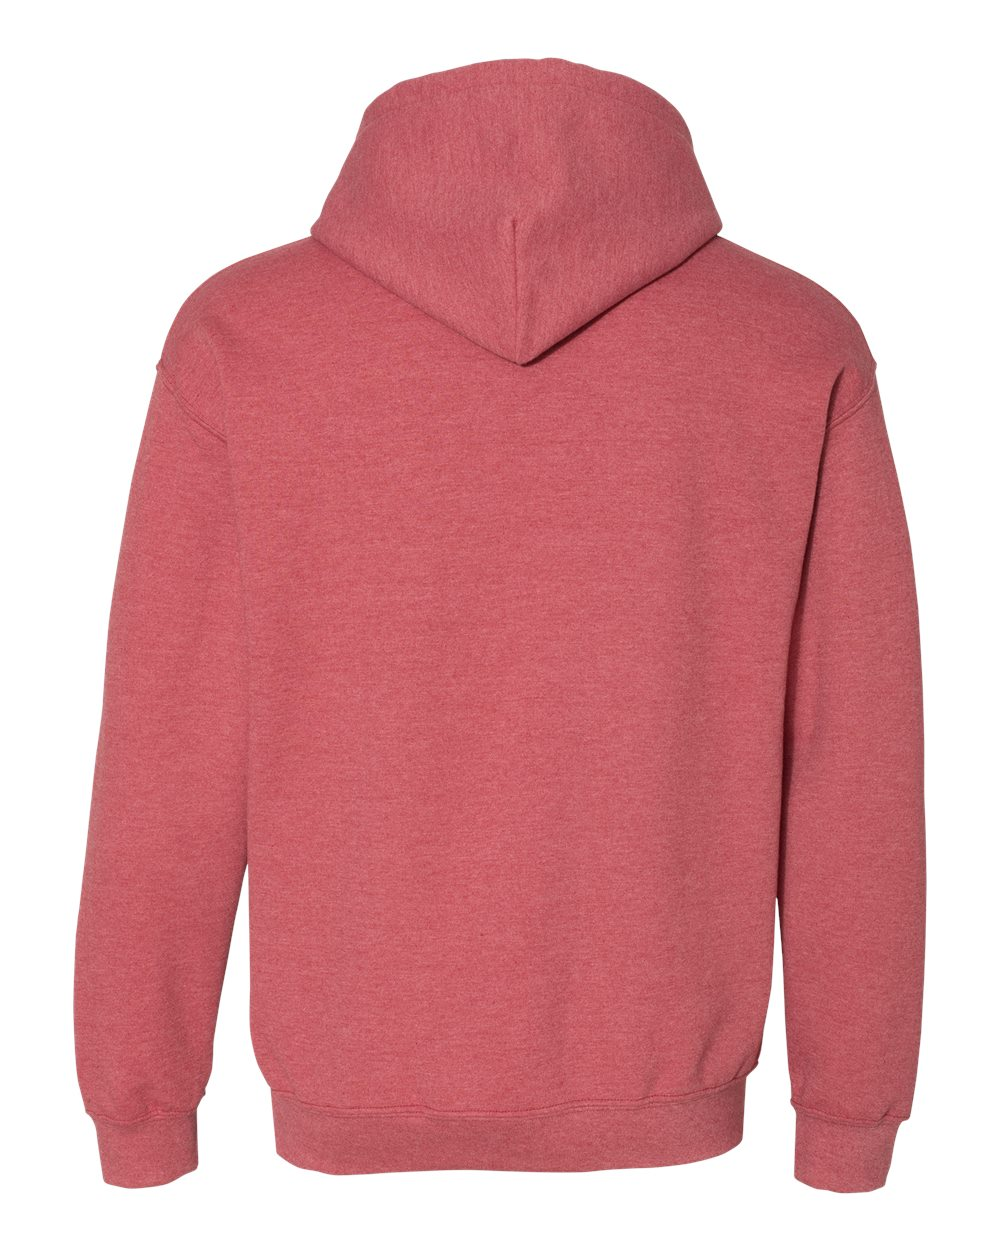 Gildan-Mens-Blank-Hoodie-Heavy-Blend-Hooded-Sweatshirt-18500-up-to-5XL thumbnail 34